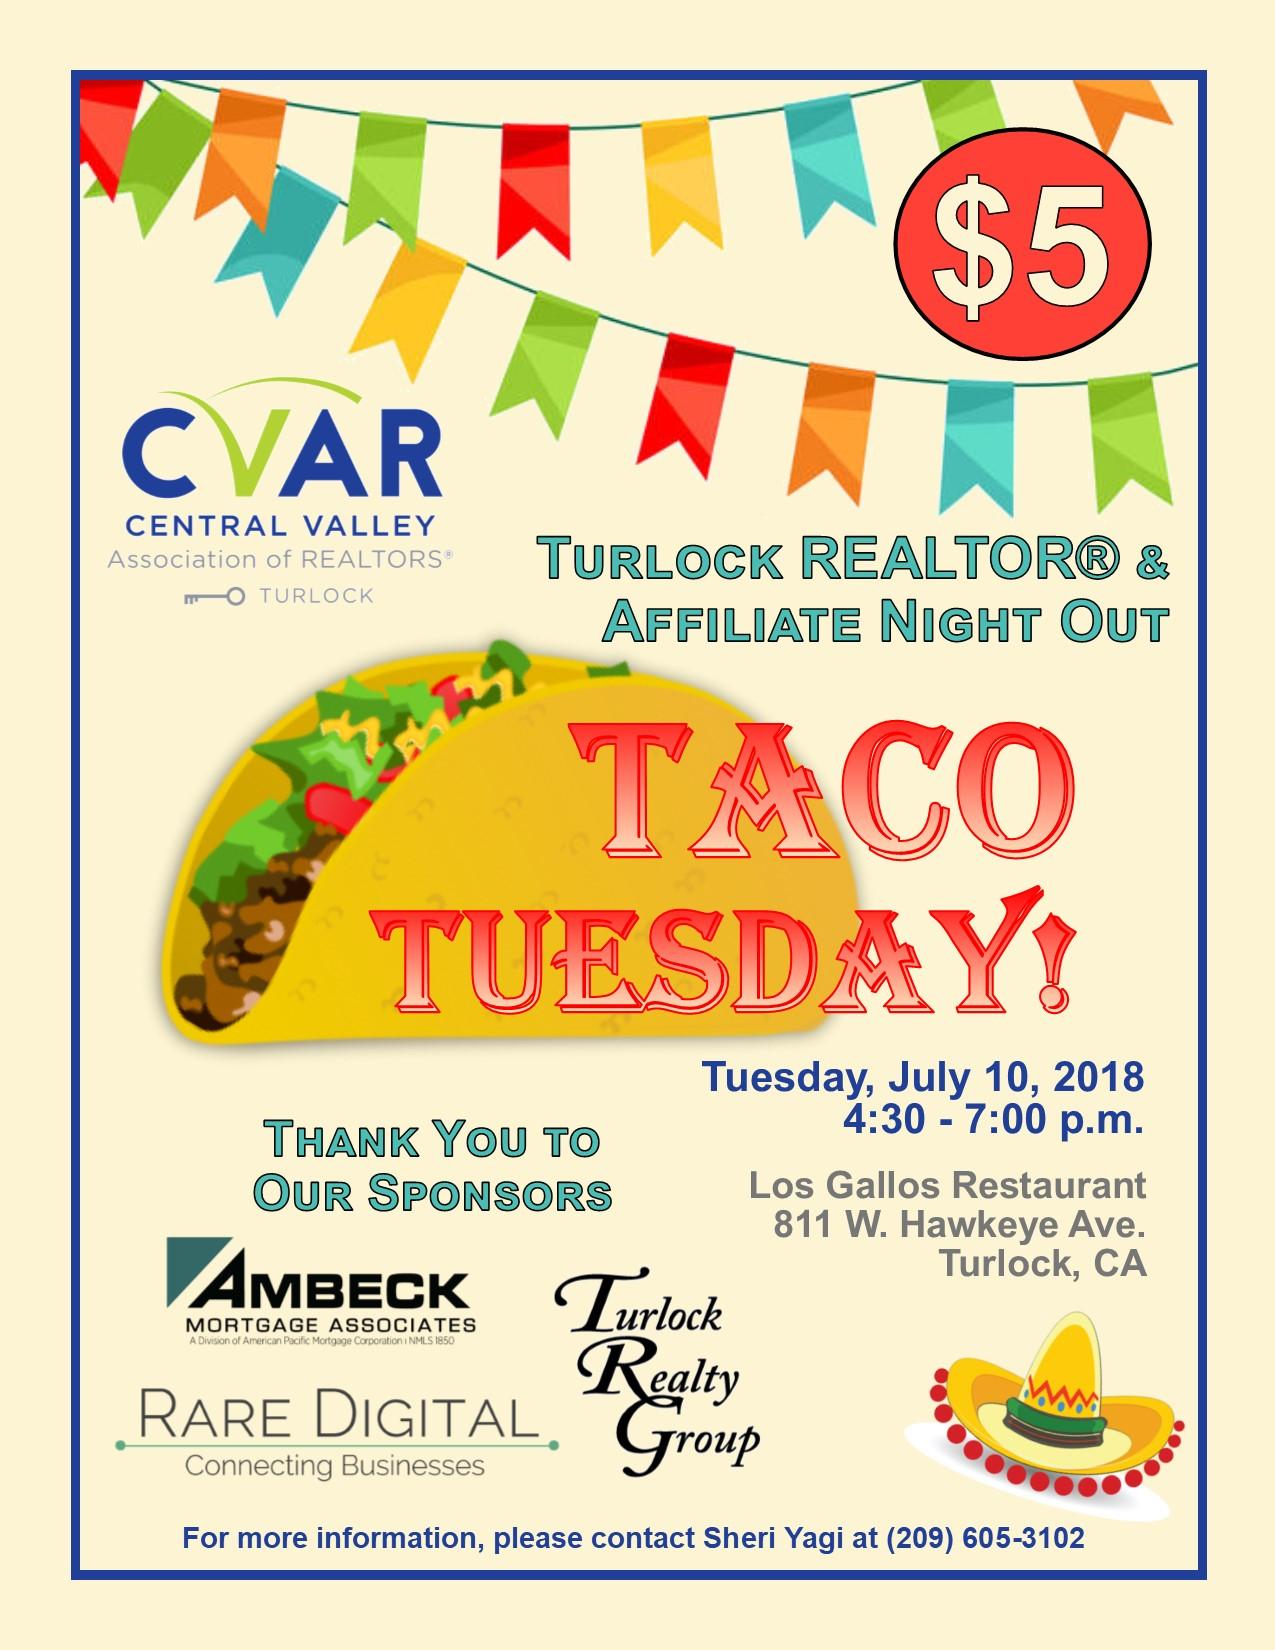 Turlock REALTOR & Affiliate Night Out - Taco Tuesday! @ Los Gallos Restaurant | Turlock | California | United States